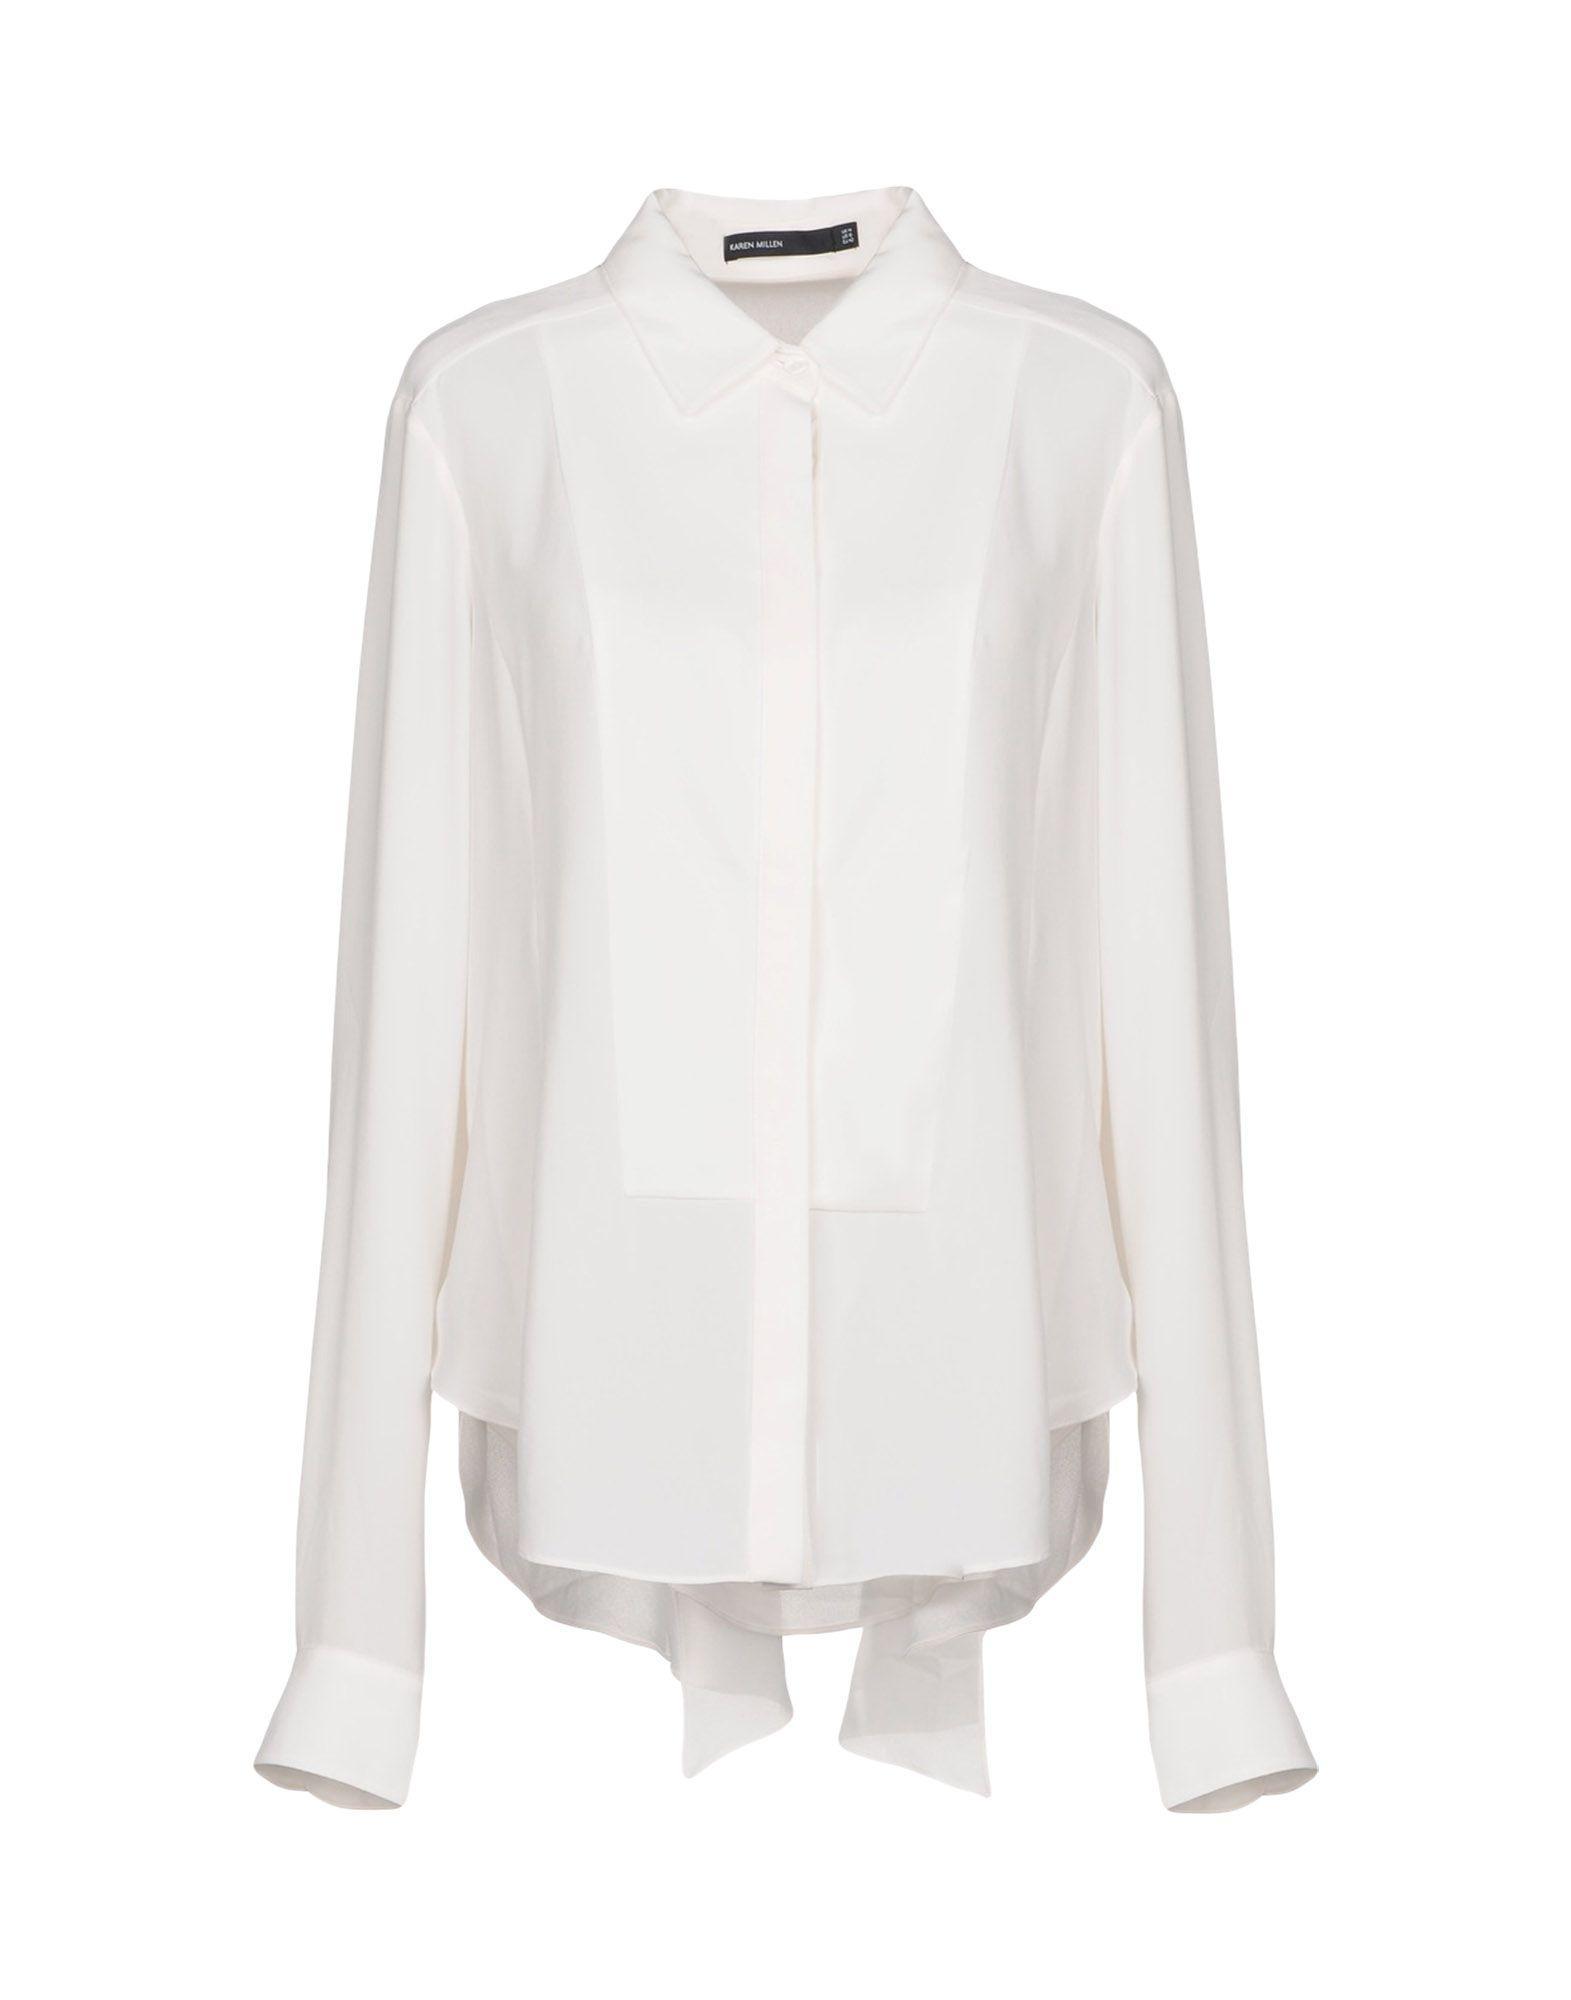 Karen Millen Shirts In Ivory